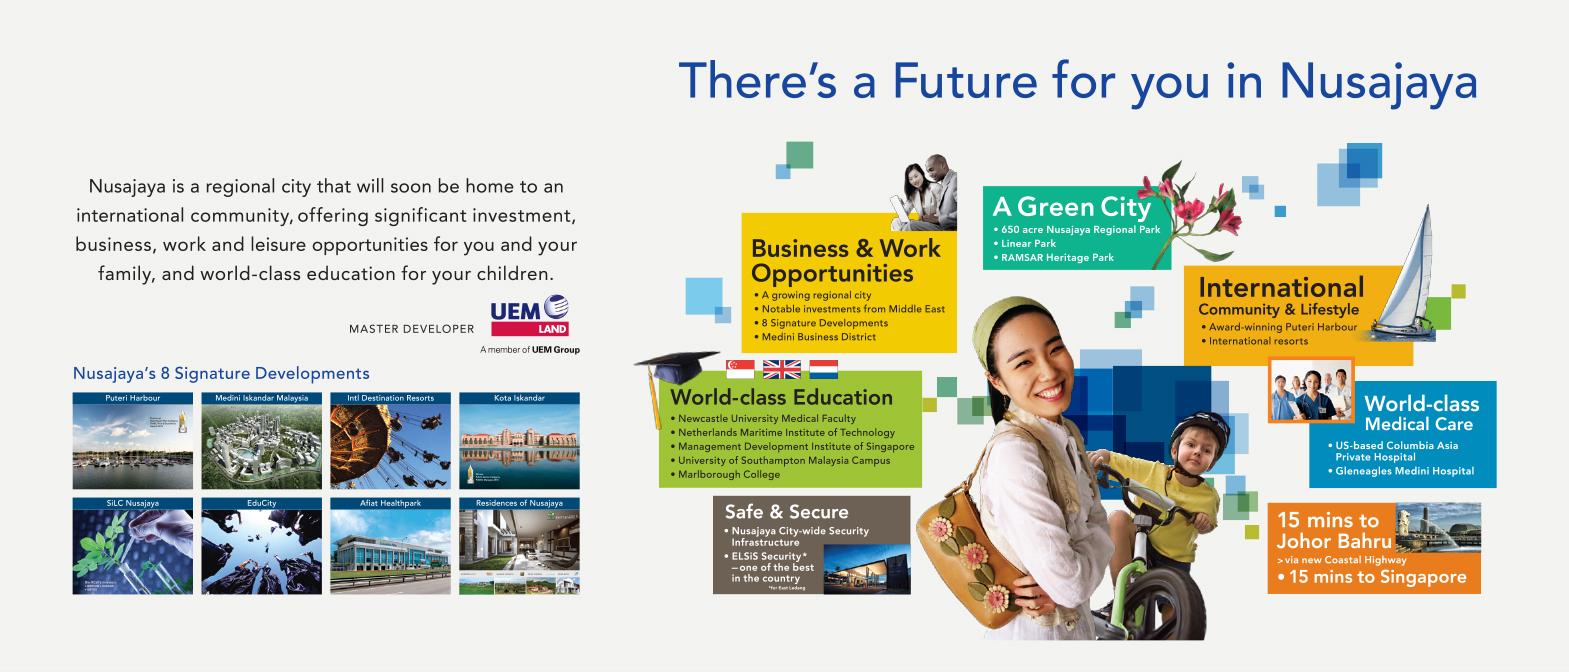 Nusajaya_A Future for You & Signature Dev.jpg